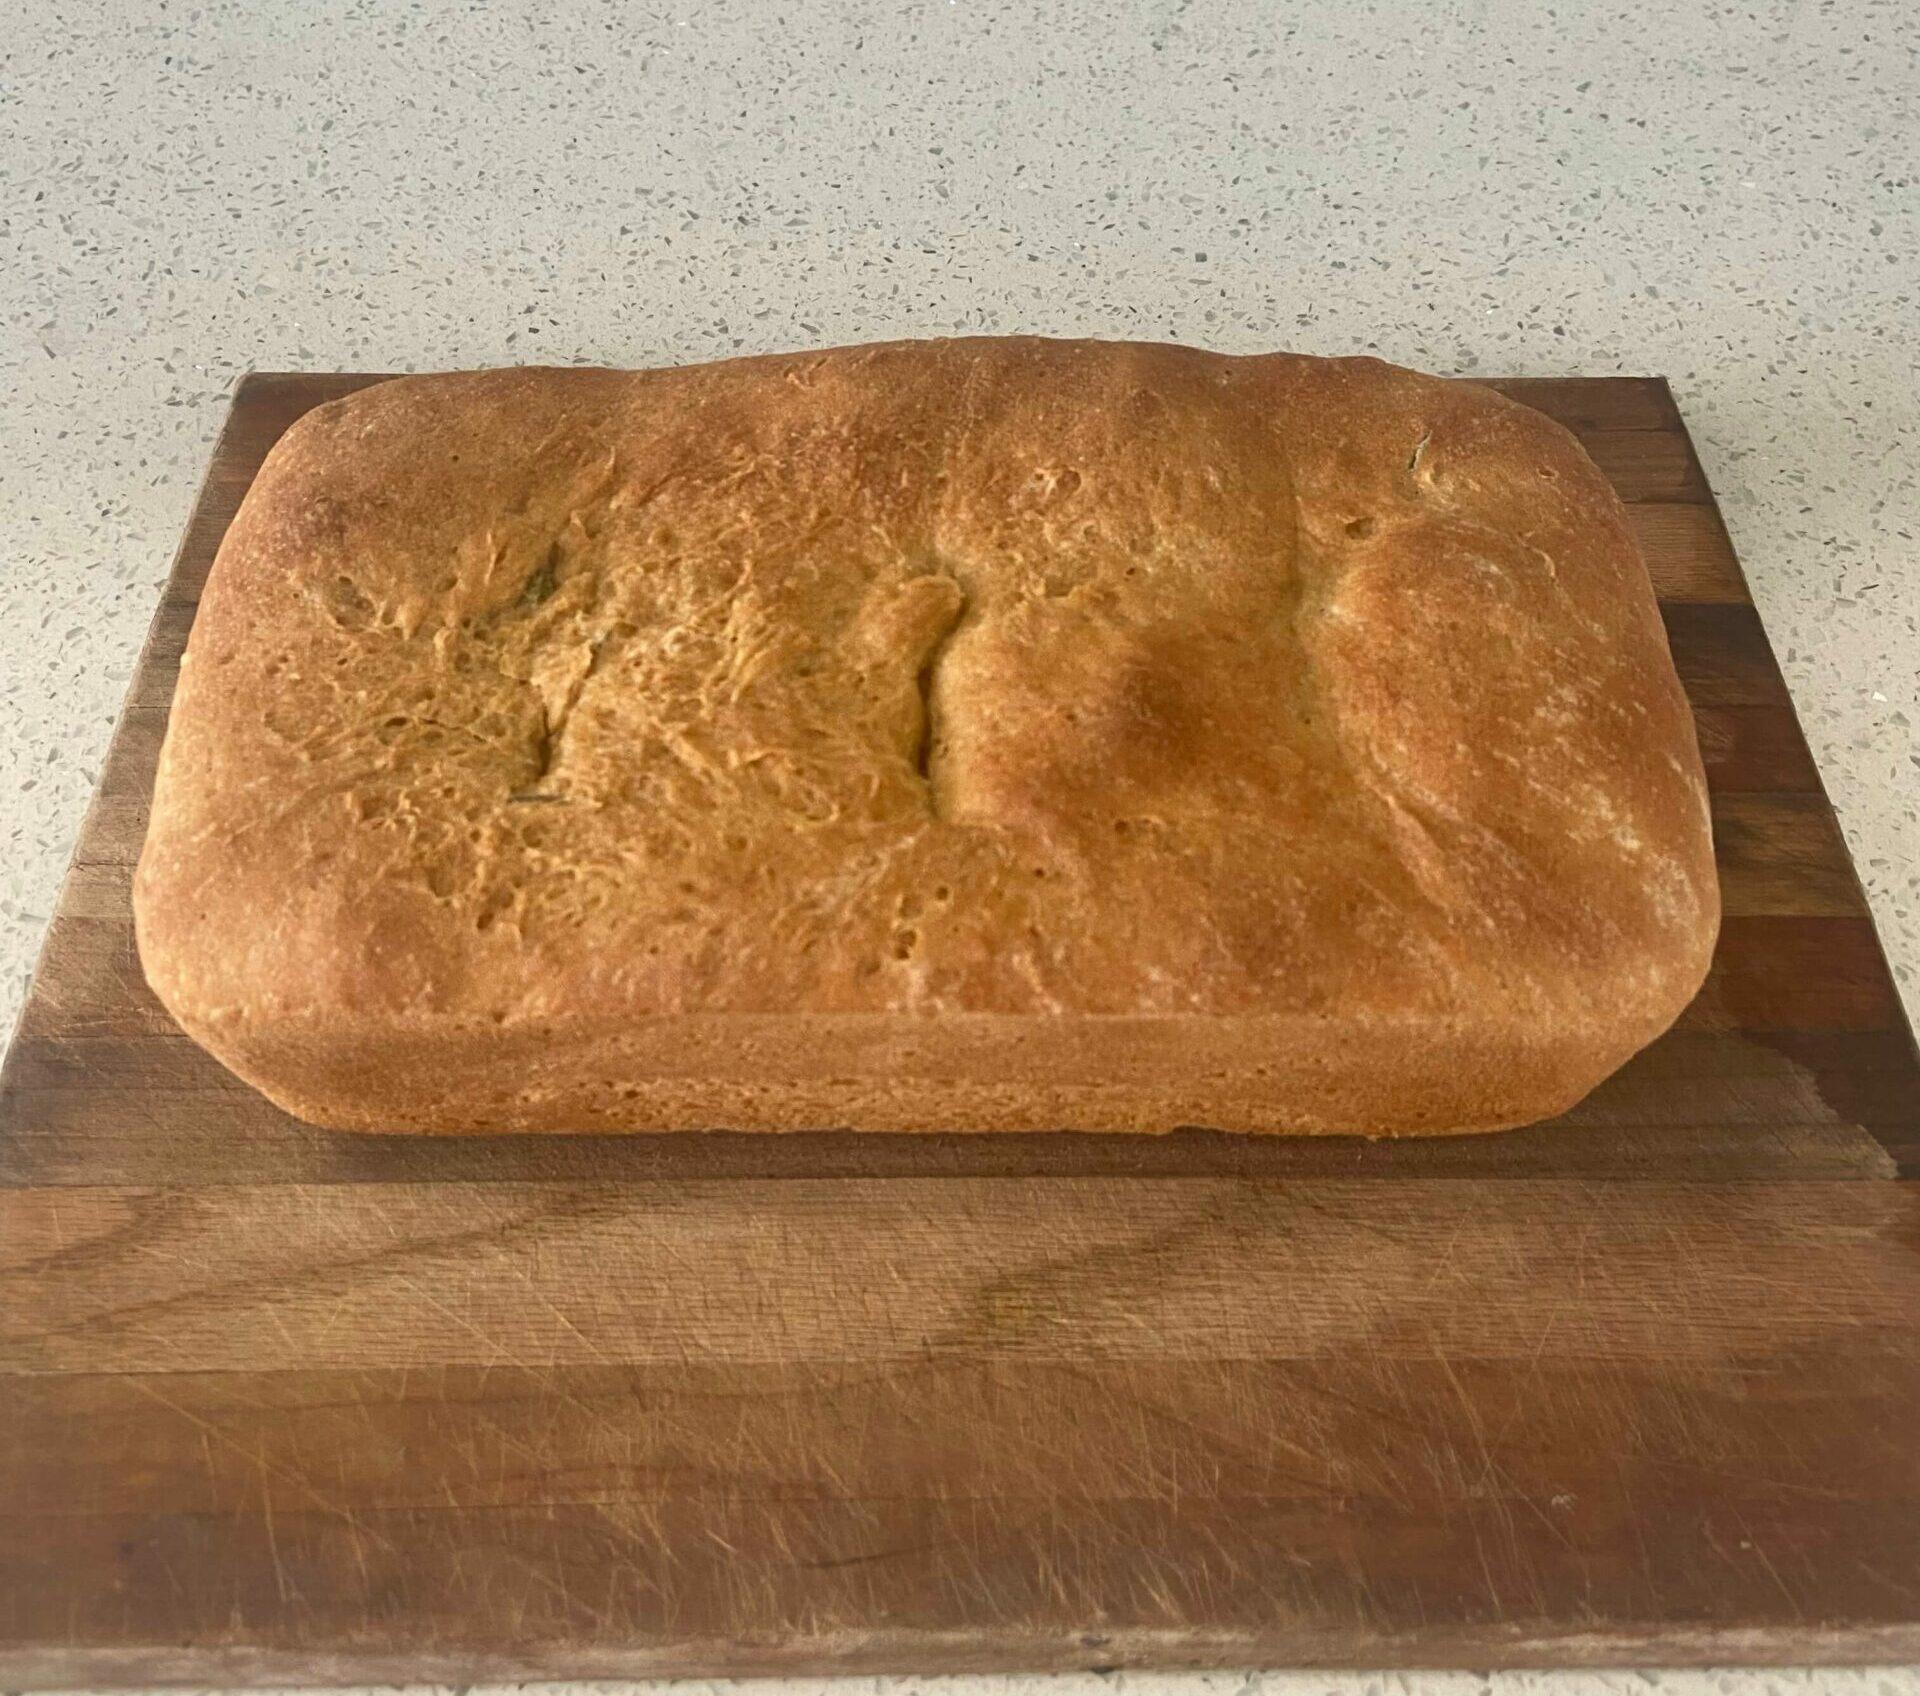 freshly baked whole wheat sourdough bread